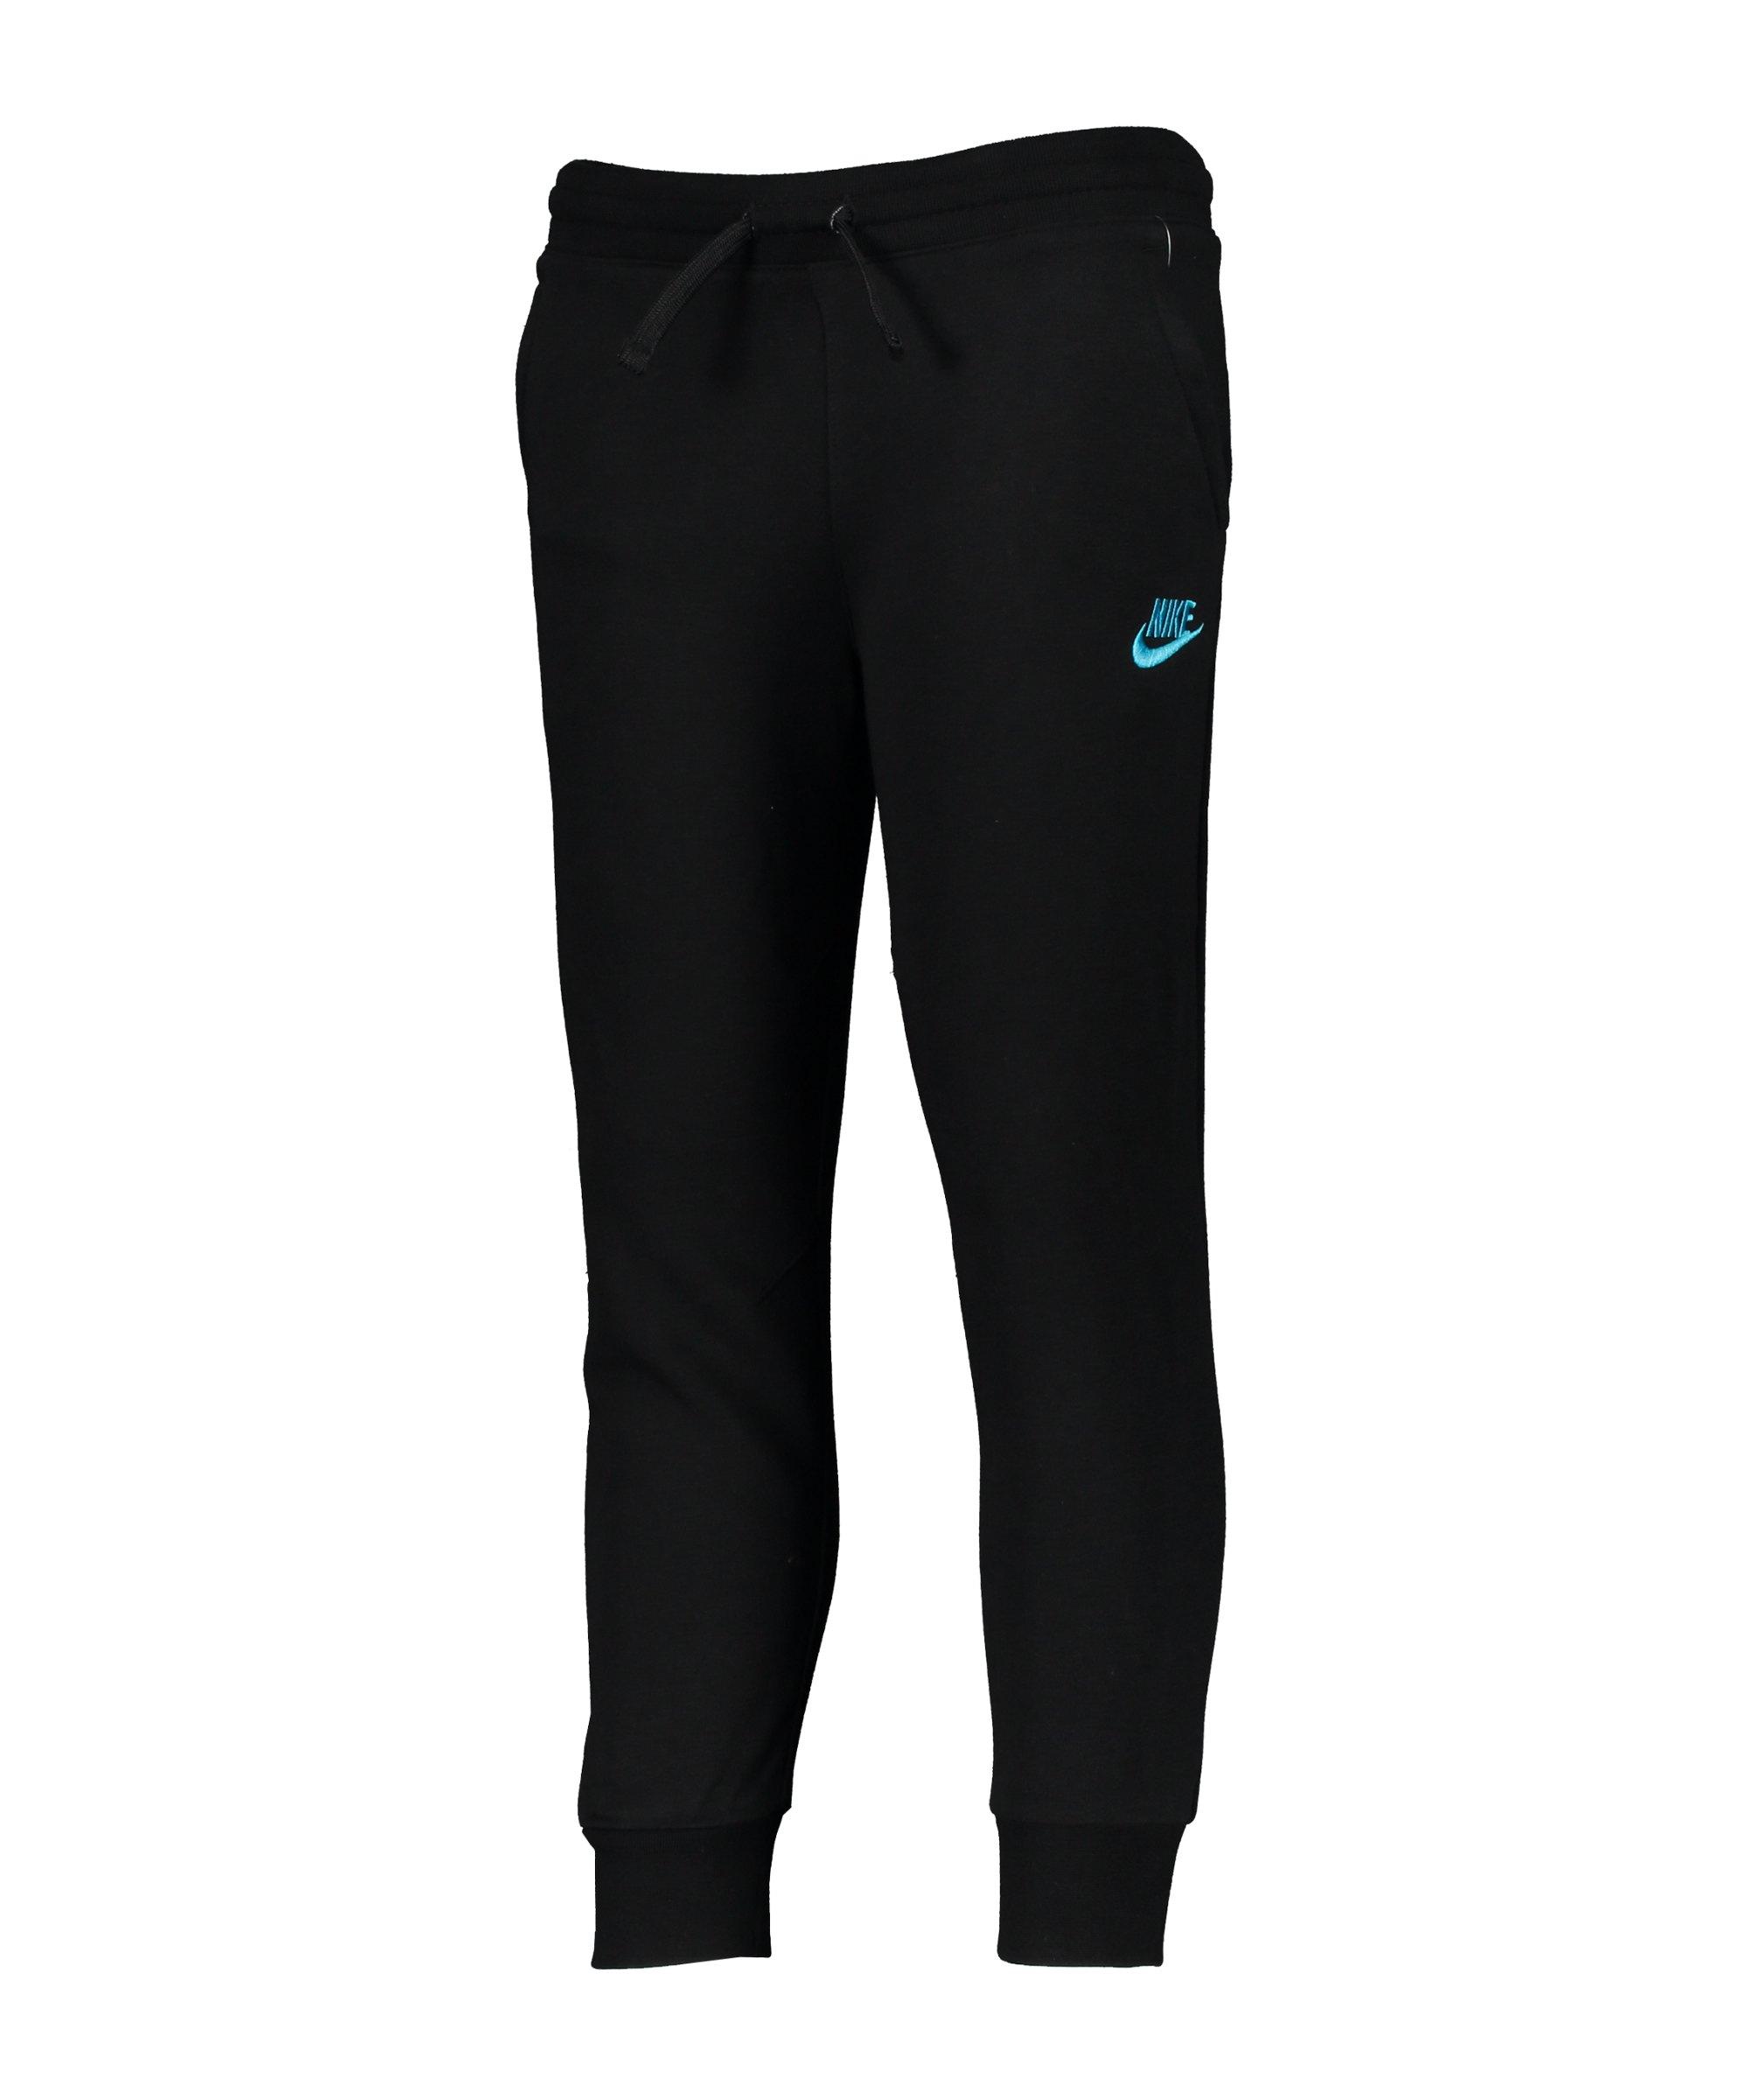 Nike AOP Jogginghose Kids Schwarz F023 - schwarz